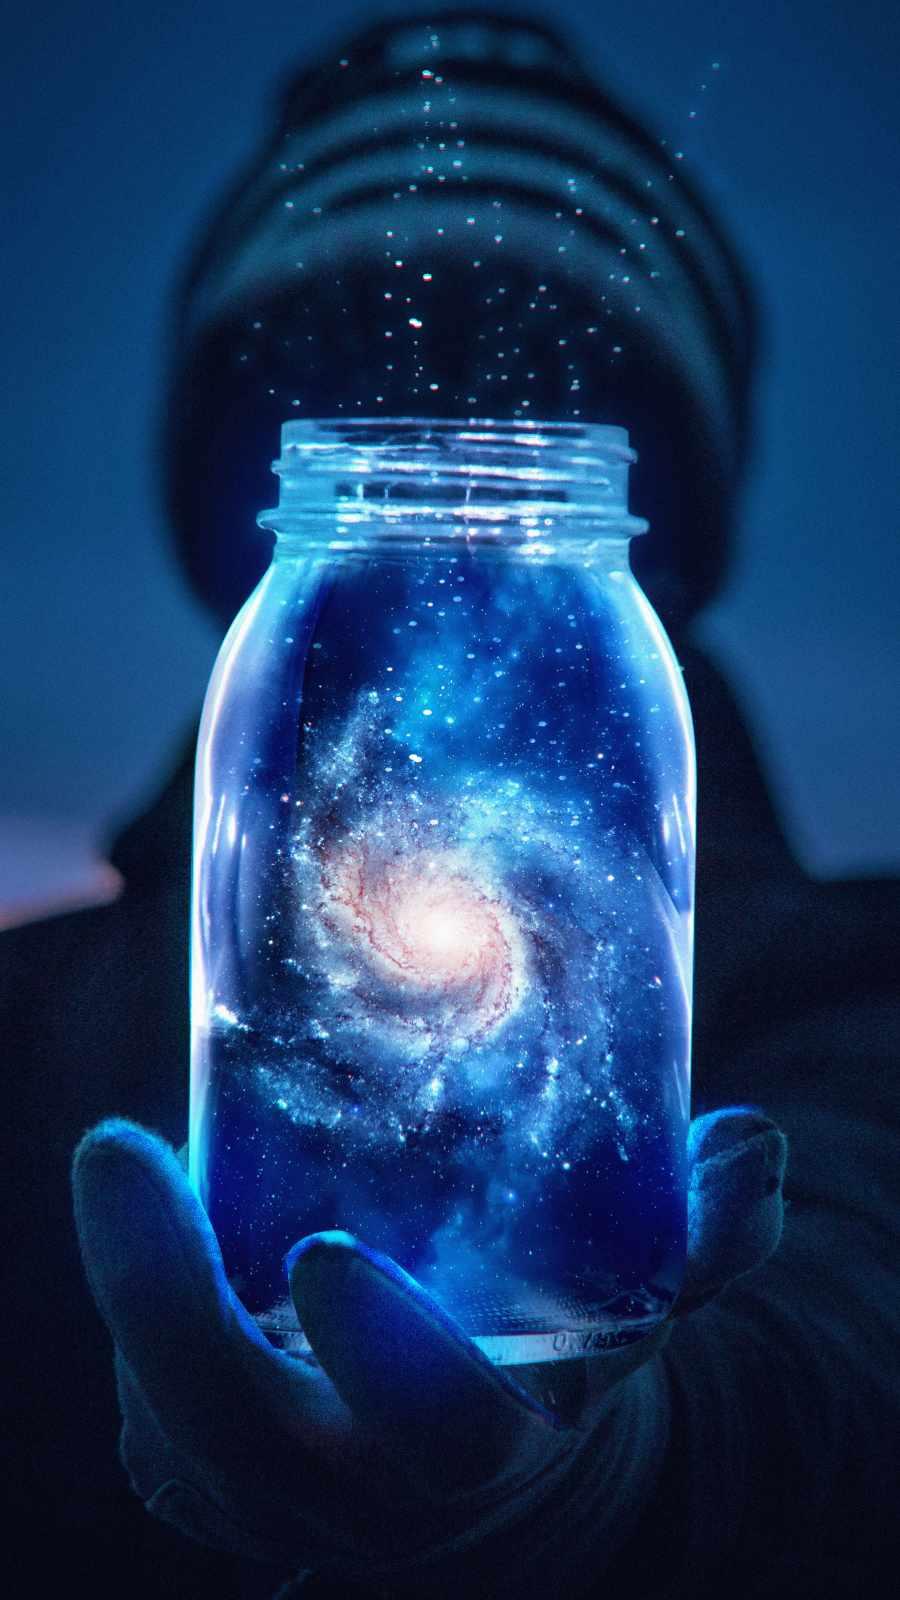 Galaxy Jar iPhone Wallpaper